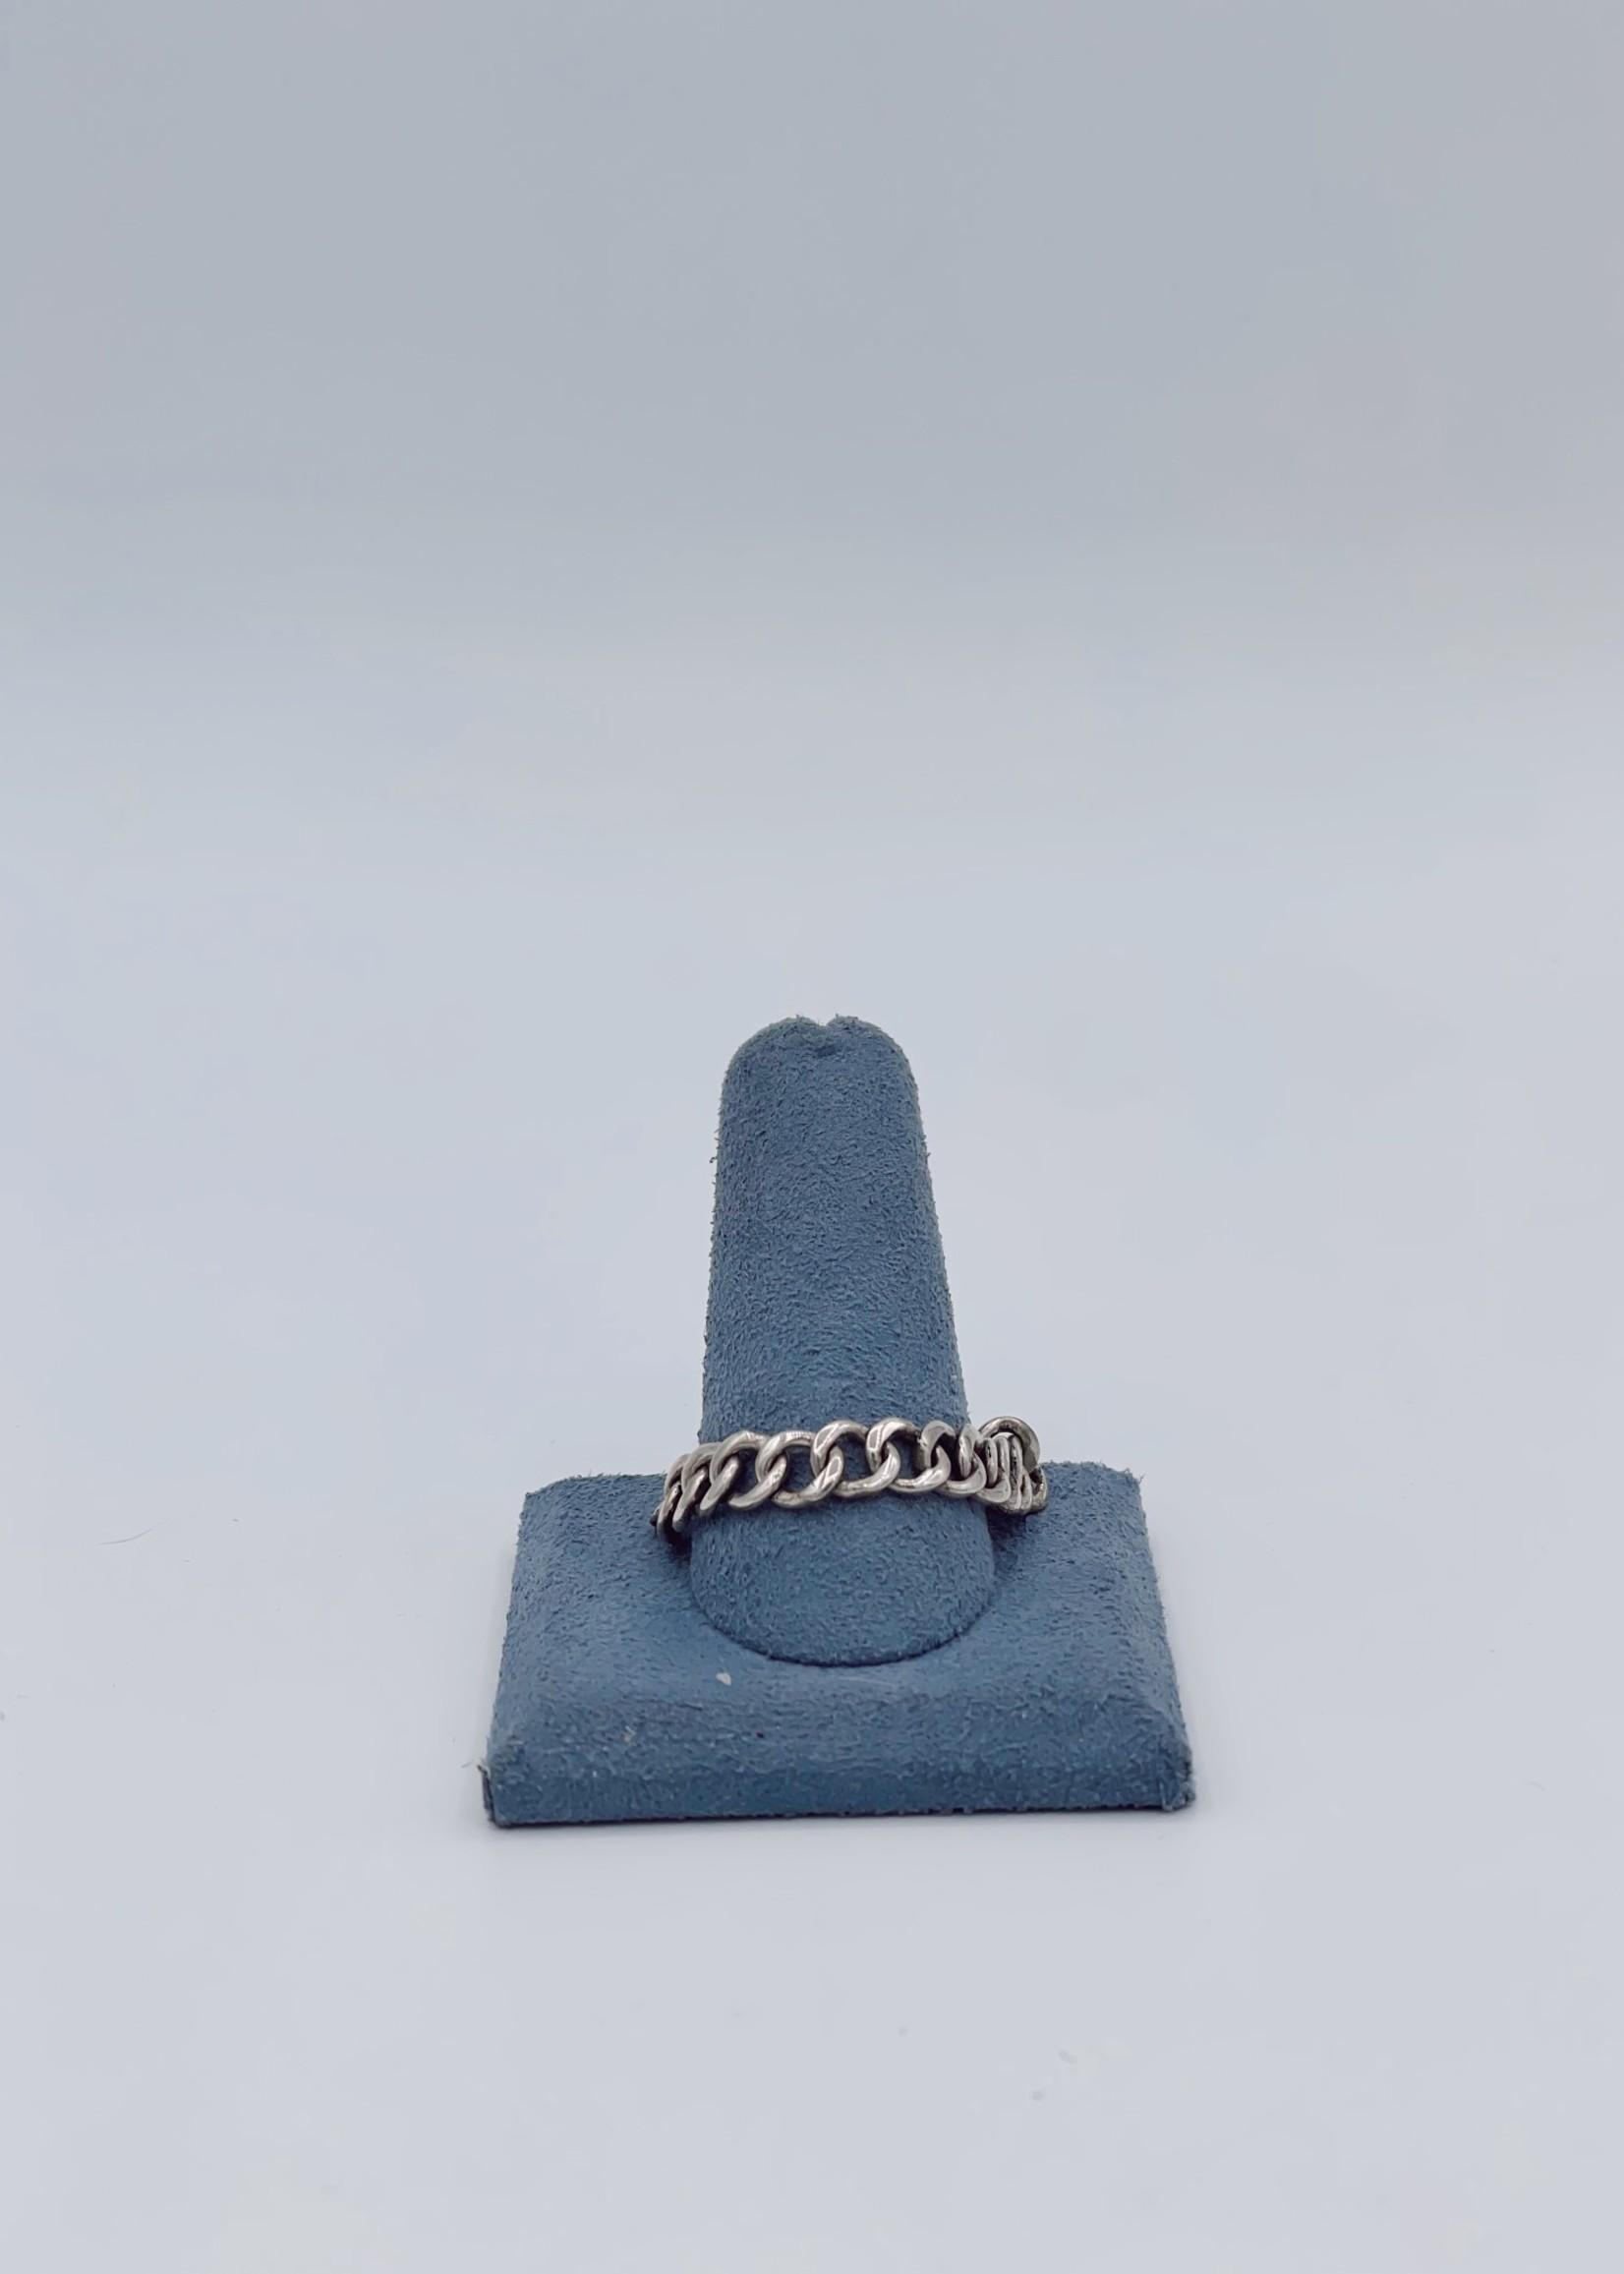 CJ Designs Sterling Silver Chain Ring